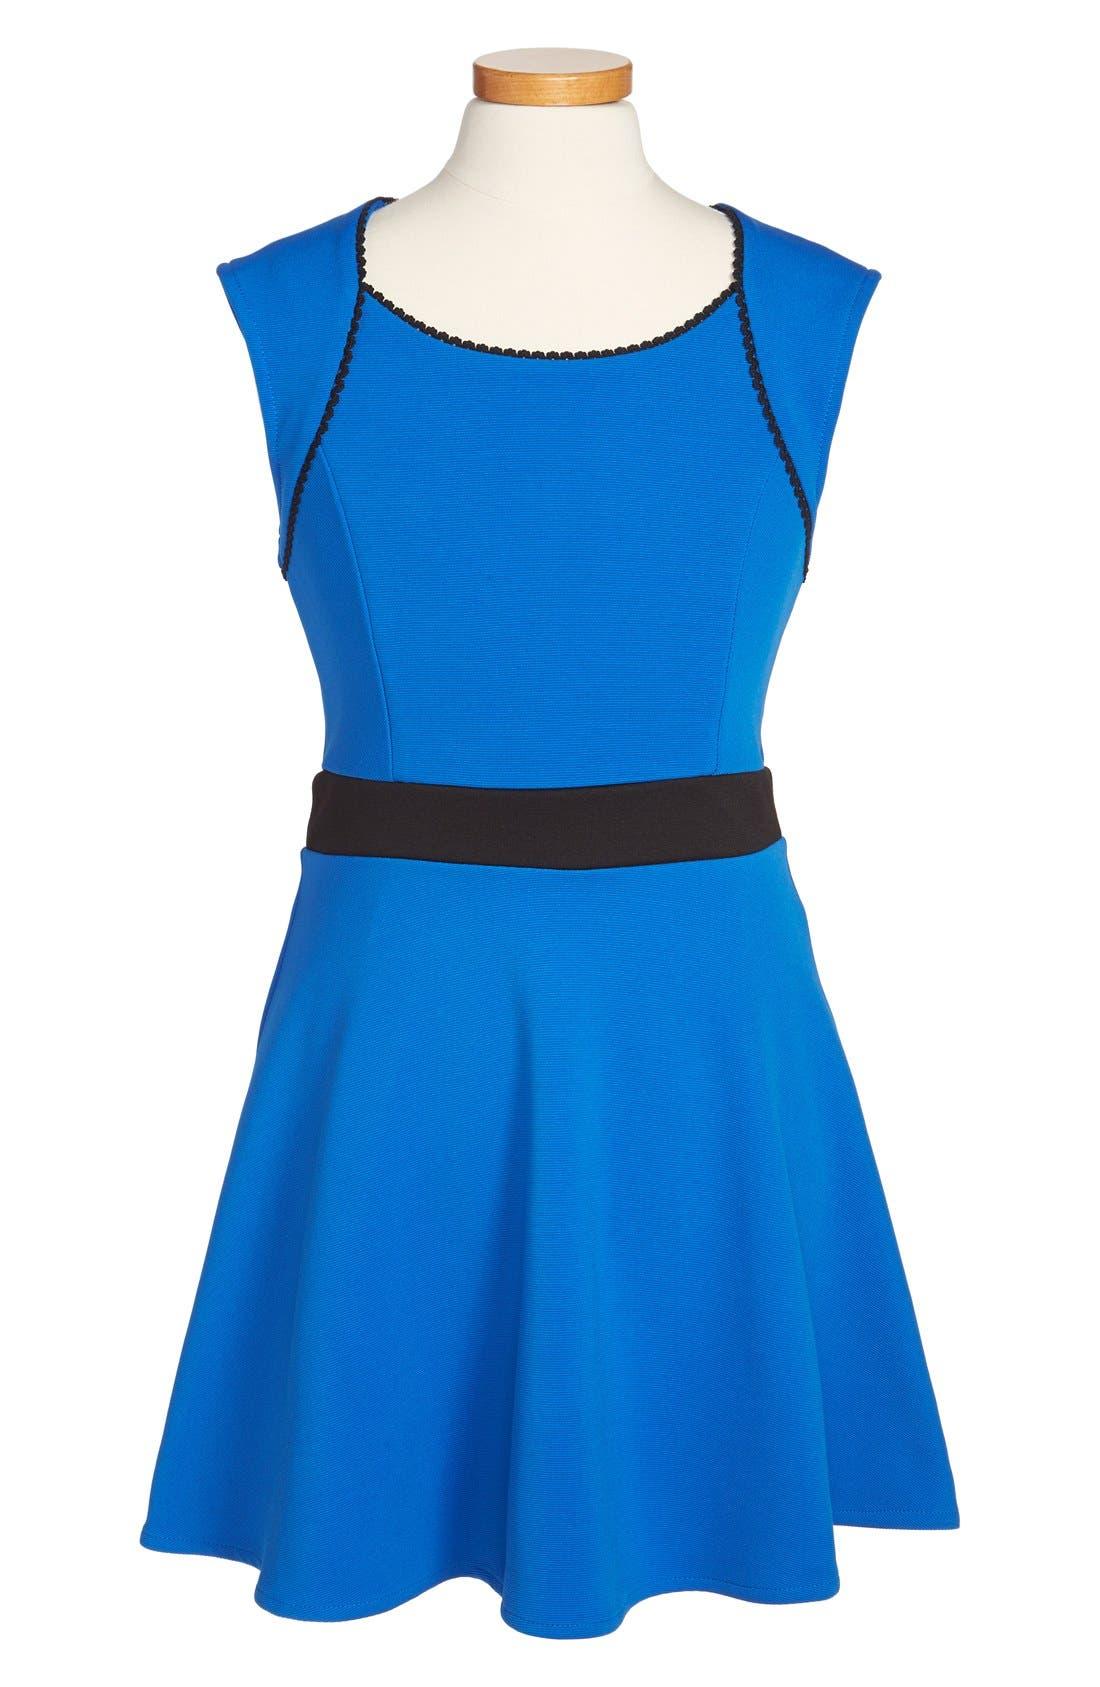 Main Image - Sally Miller 'Chloe' Dress (Big Girls)